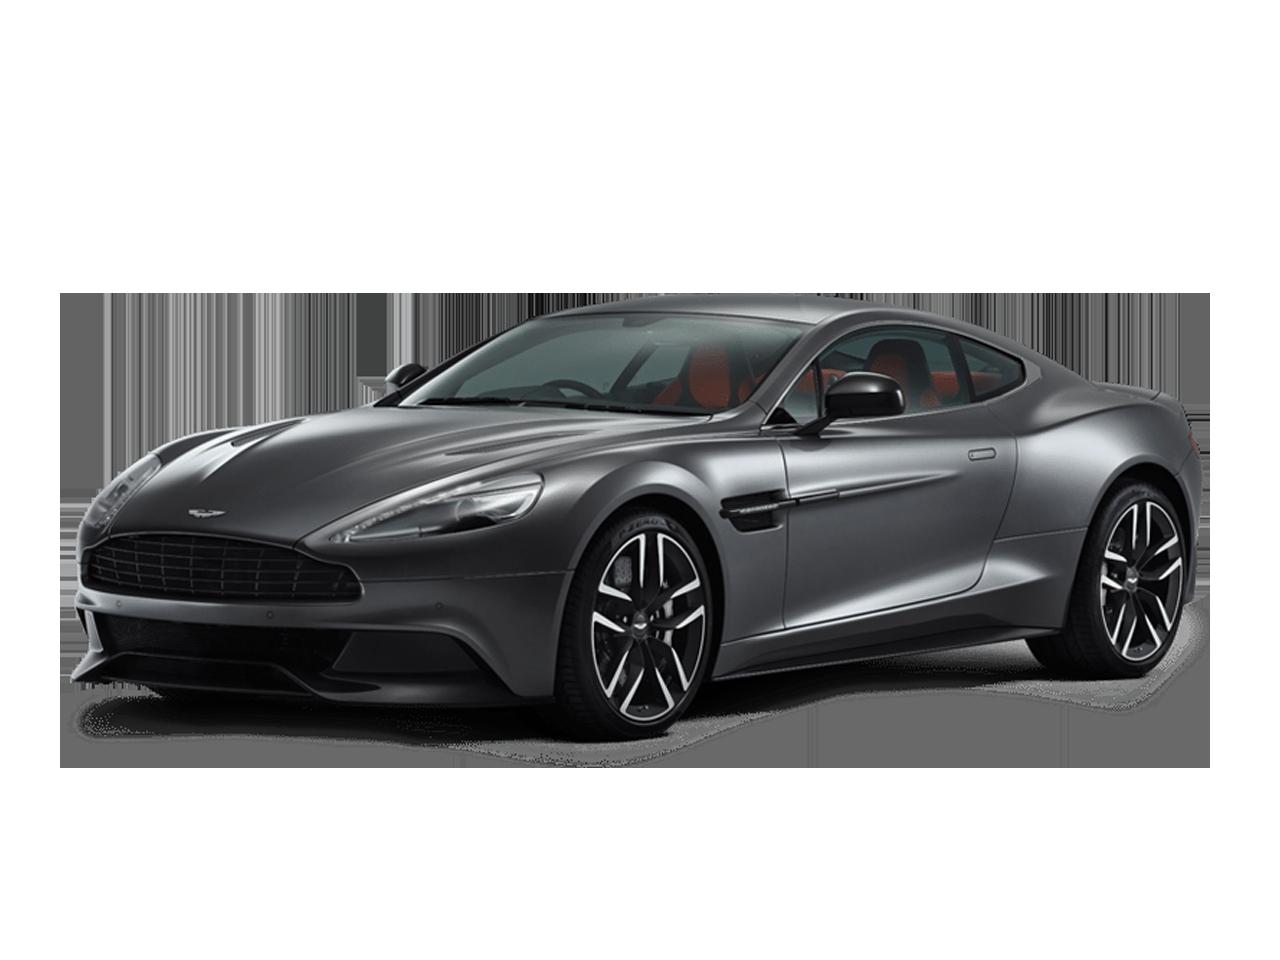 2018 Aston Martin Db11 In Van Nuys Aston Martin Dealer Los Angeles